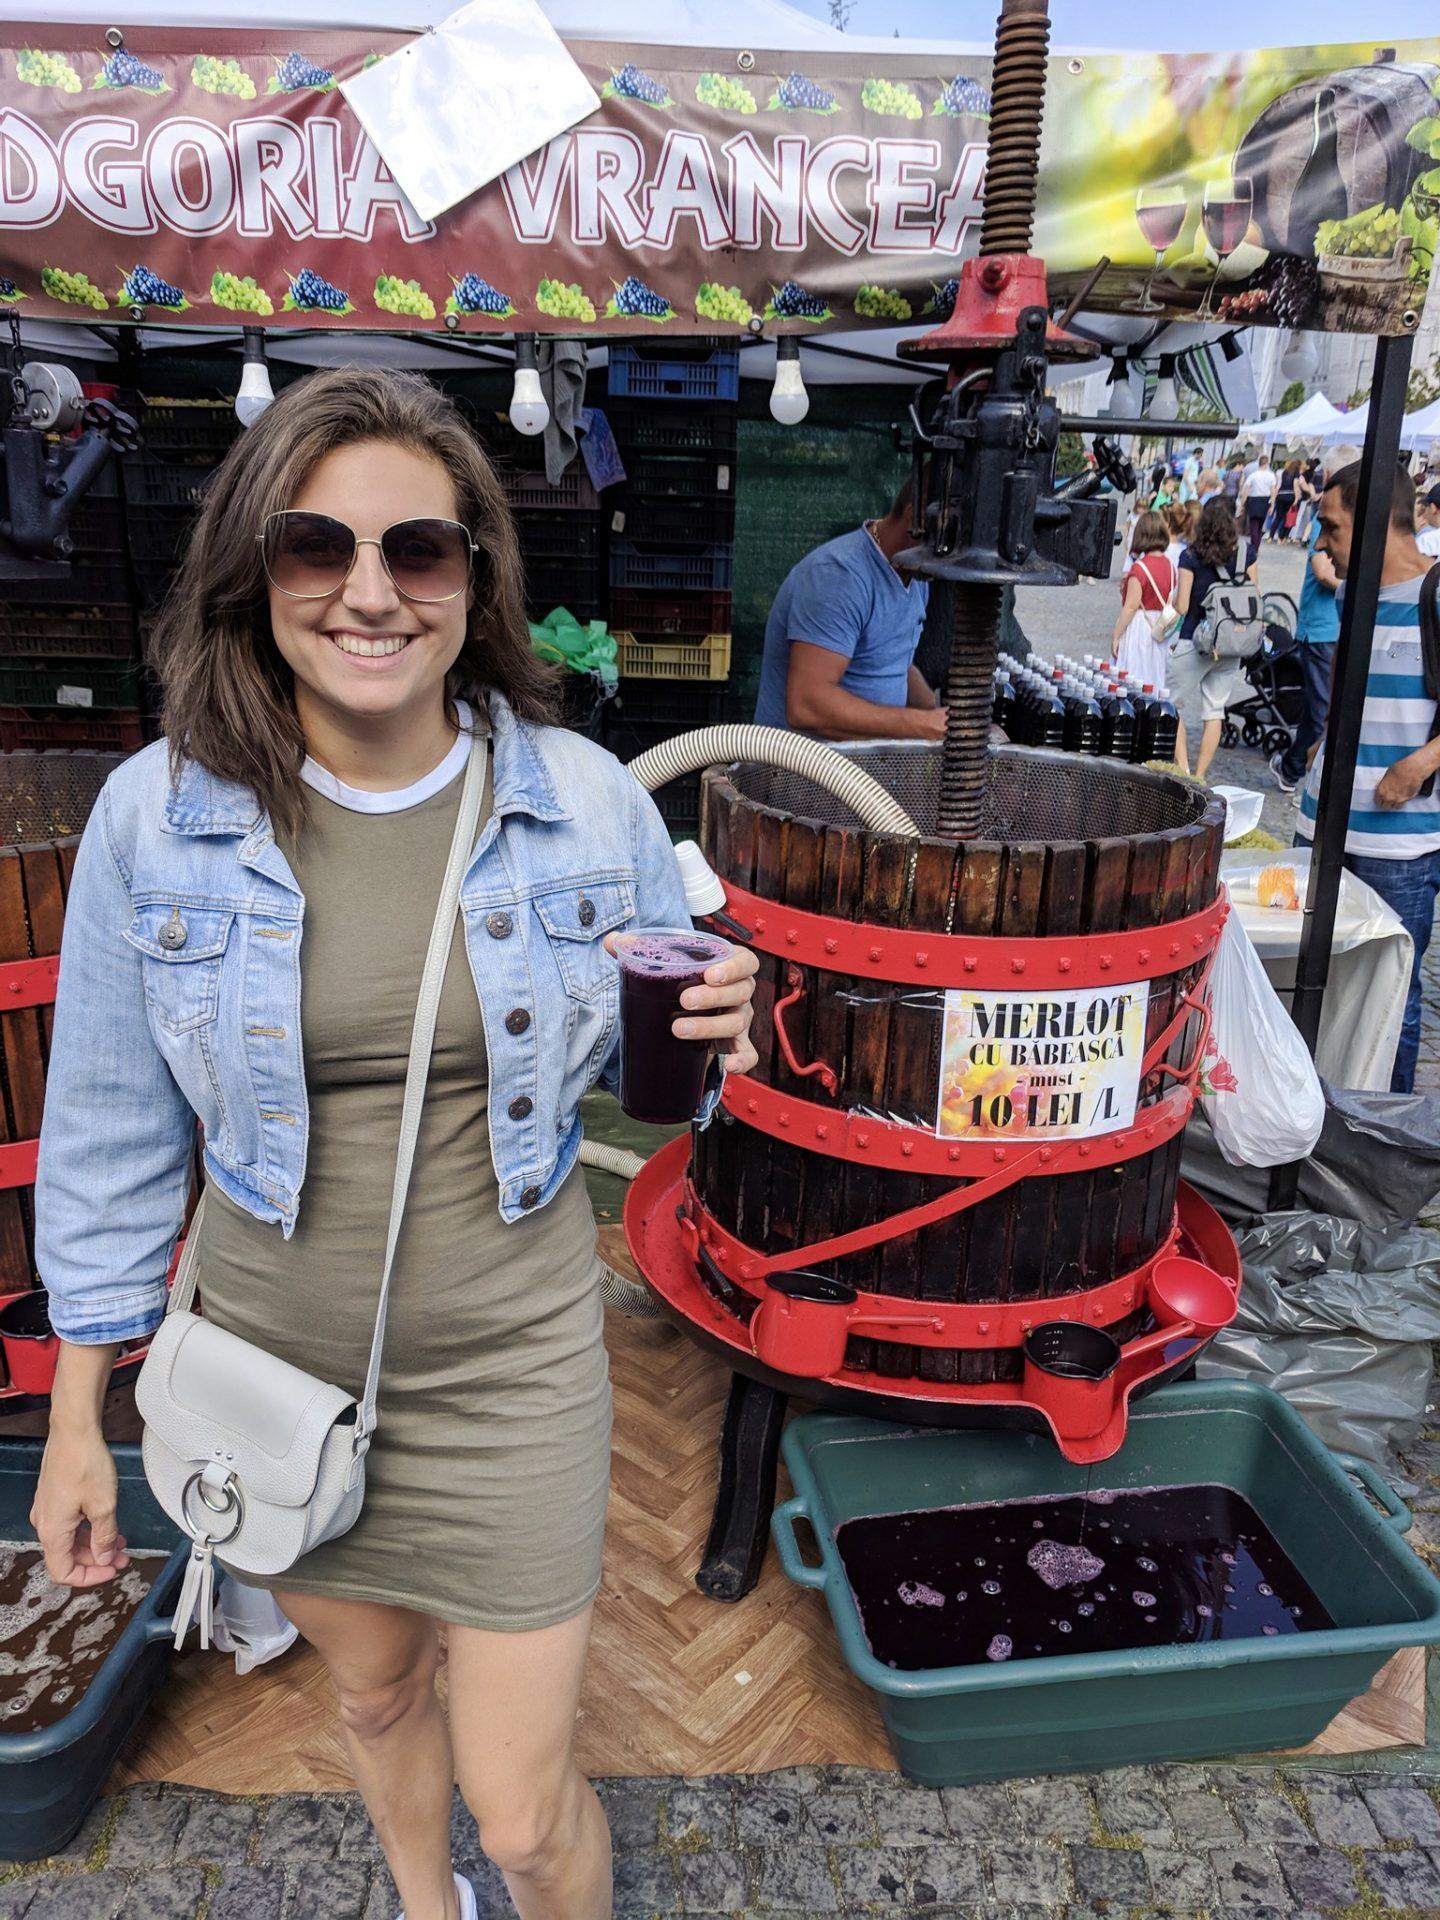 Girl in front of barrel of wine